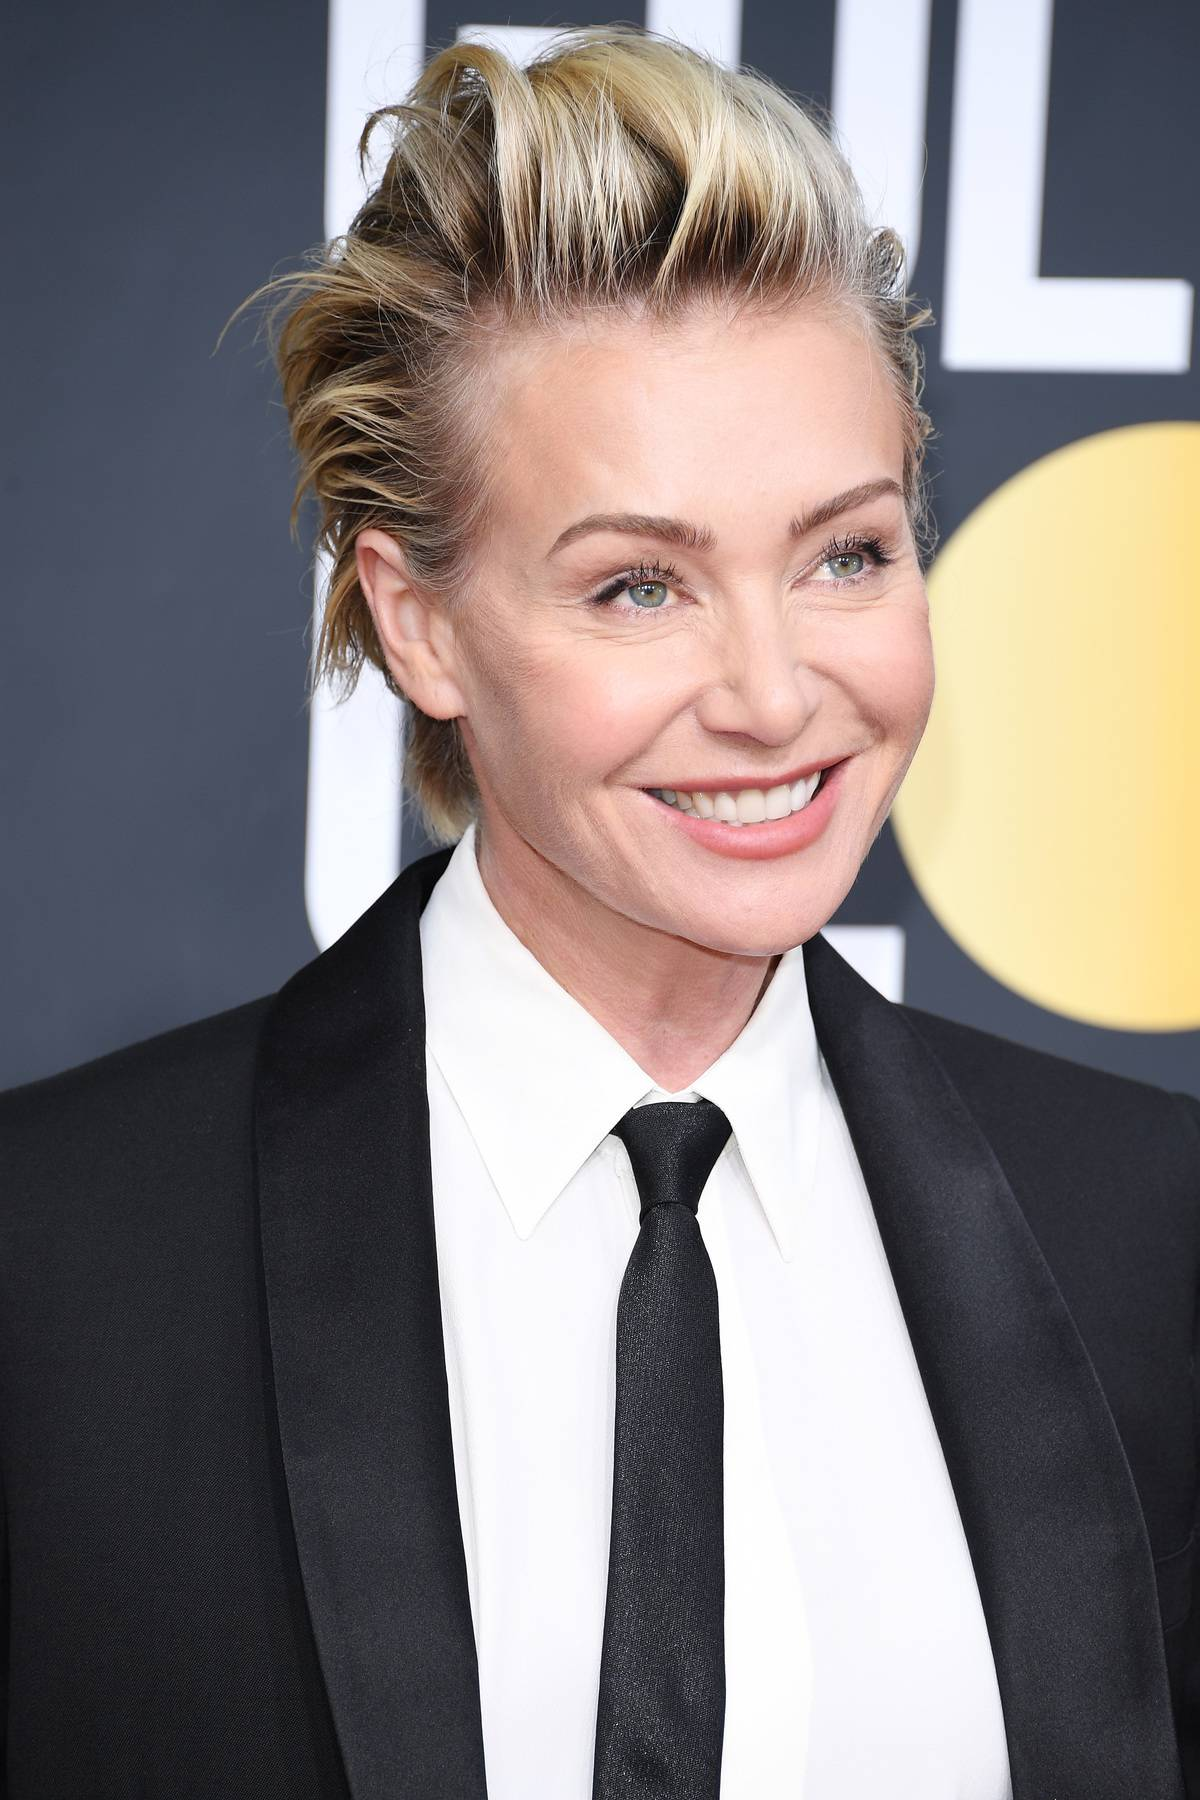 BEVERLY HILLS, CALIFORNIA - JANUARY 05: Portia de Rossi attends the 77th Annual Golden Globe Awards at The Beverly Hilton Hotel on January 05, 2020 in Beverly Hills, California.